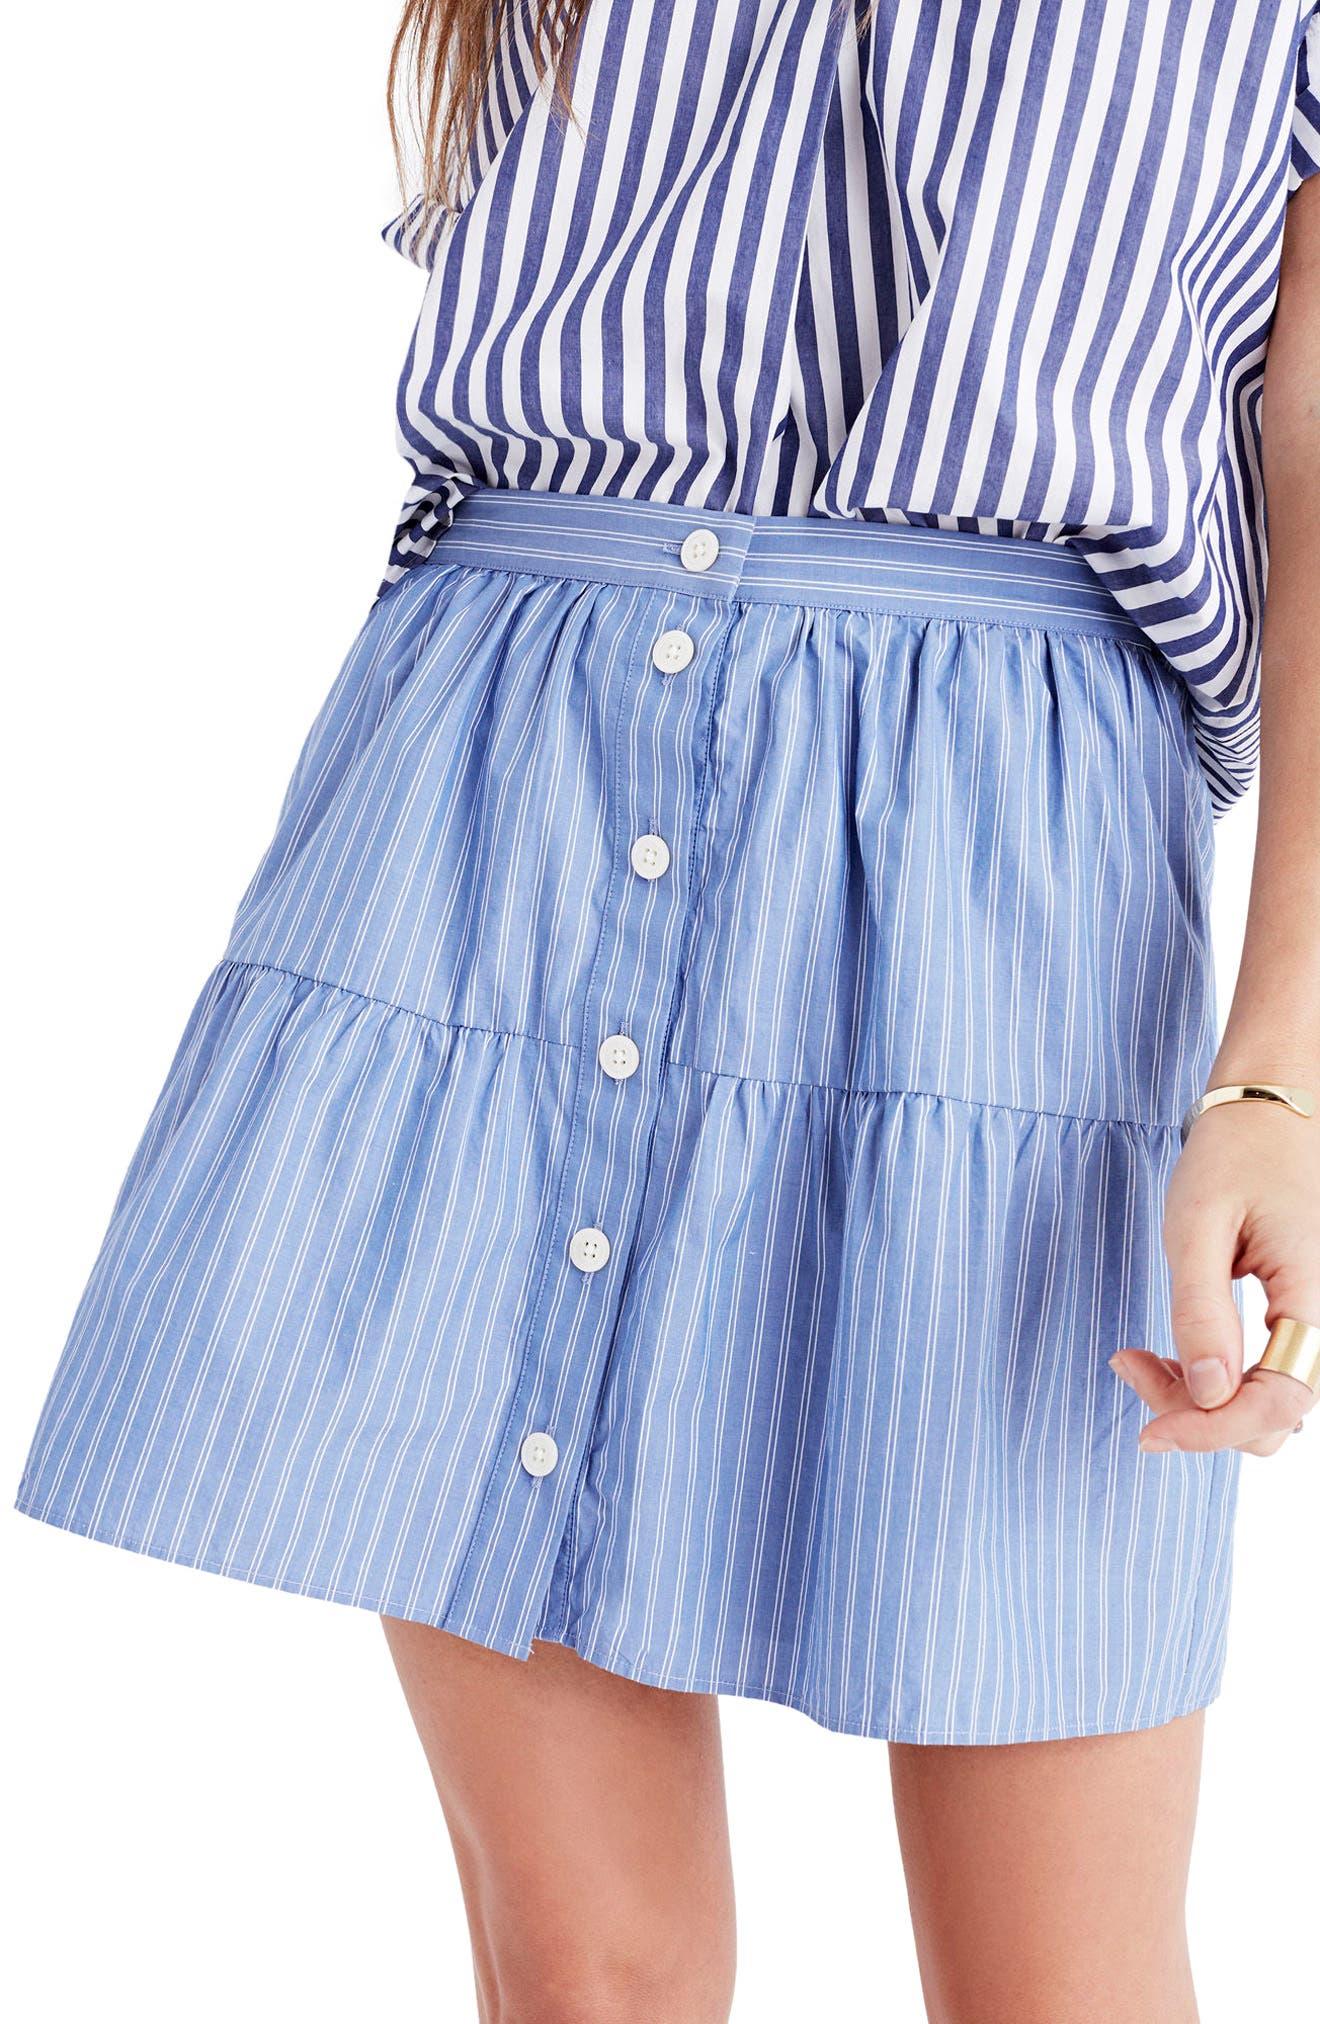 Main Image - Madewell Bistro Stripe Skirt